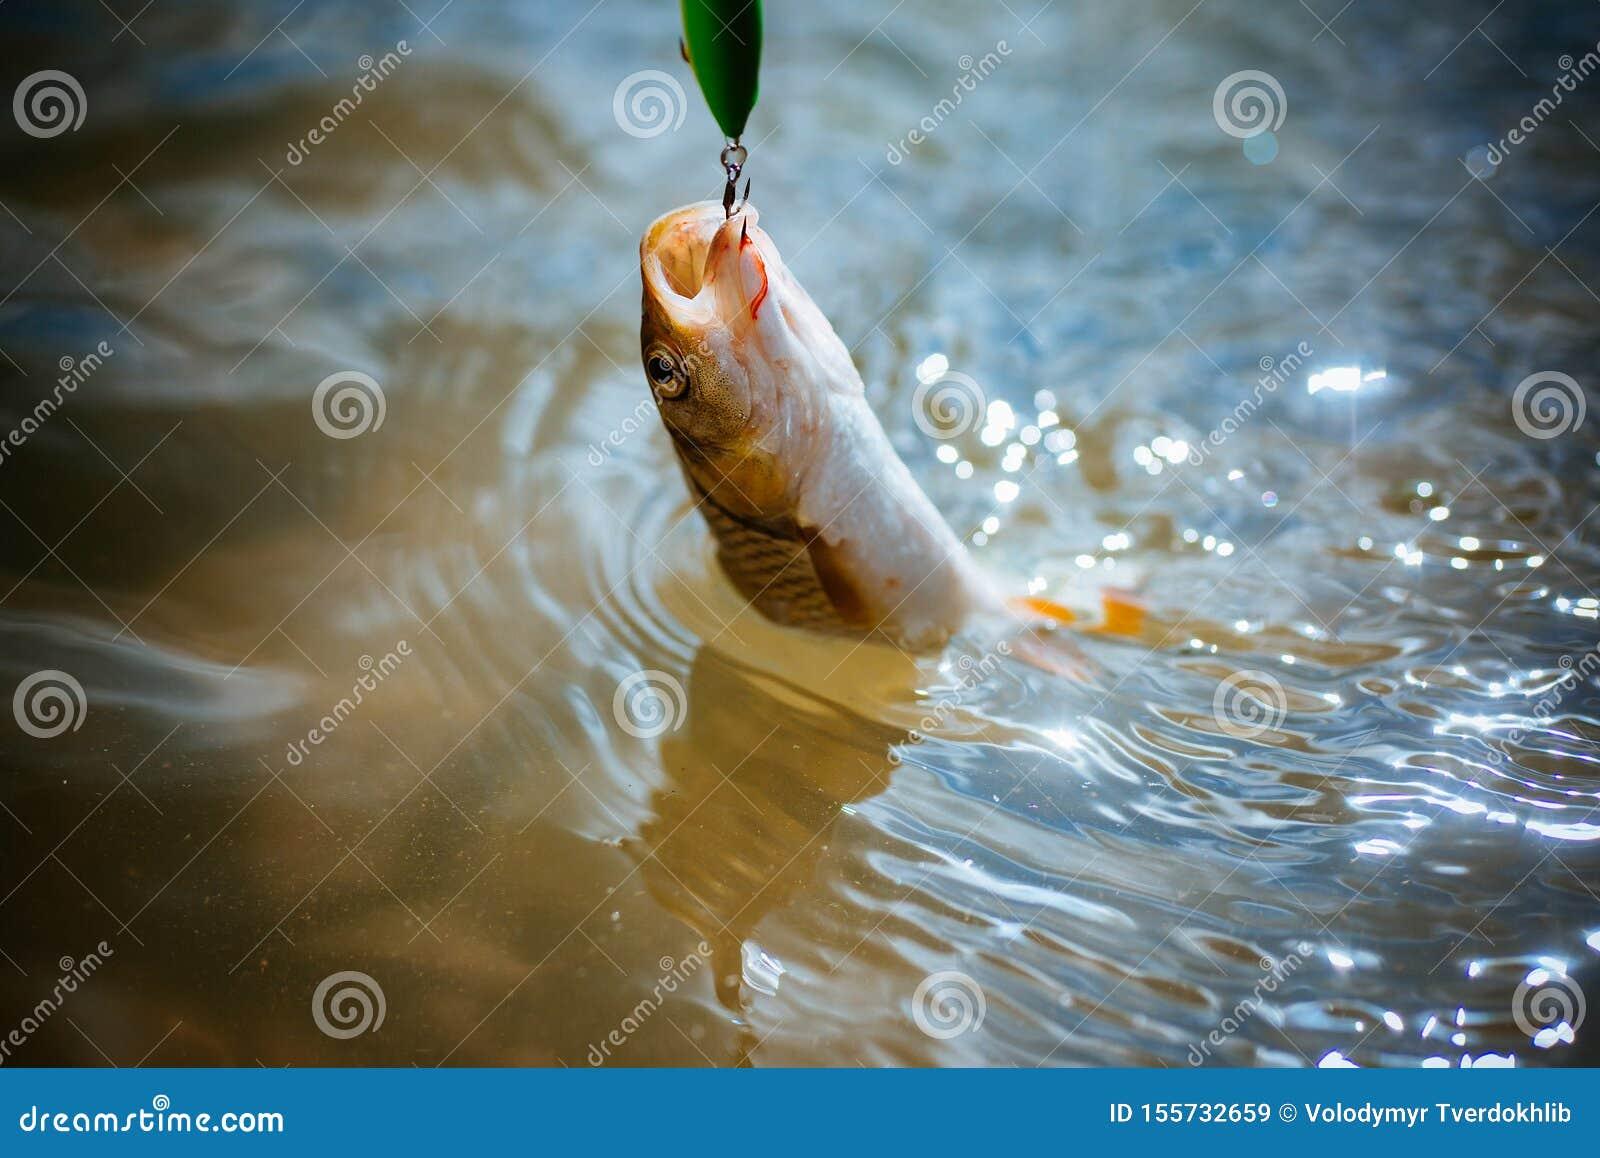 Bass fishing splash. Catching a big fish with a fishing pole. Lure fishing.